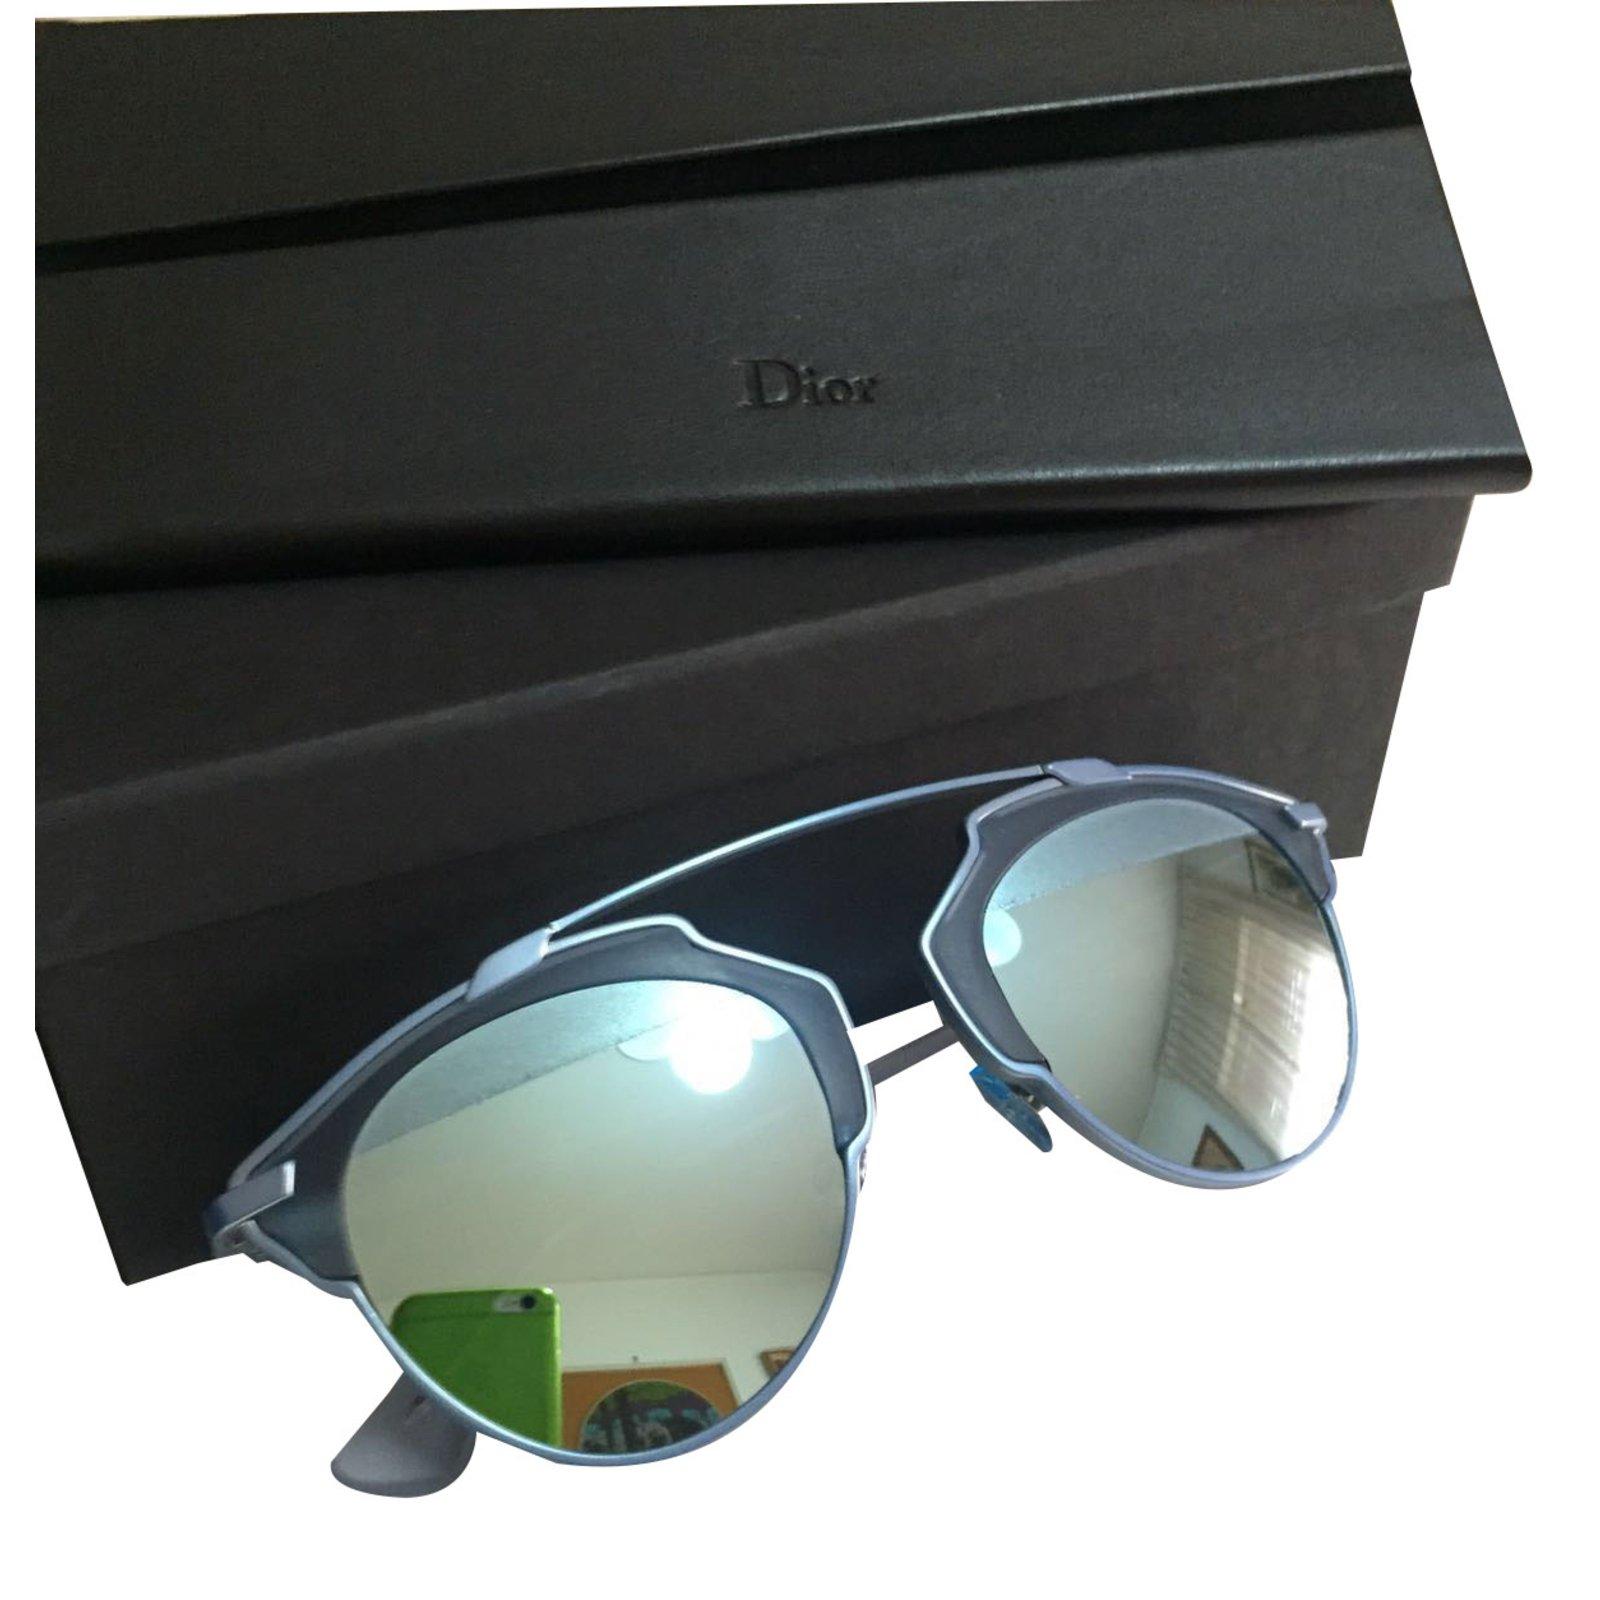 94e047bb53d6 Facebook · Pin This. Dior Sunglasses Sunglasses Metal Blue ref.19744